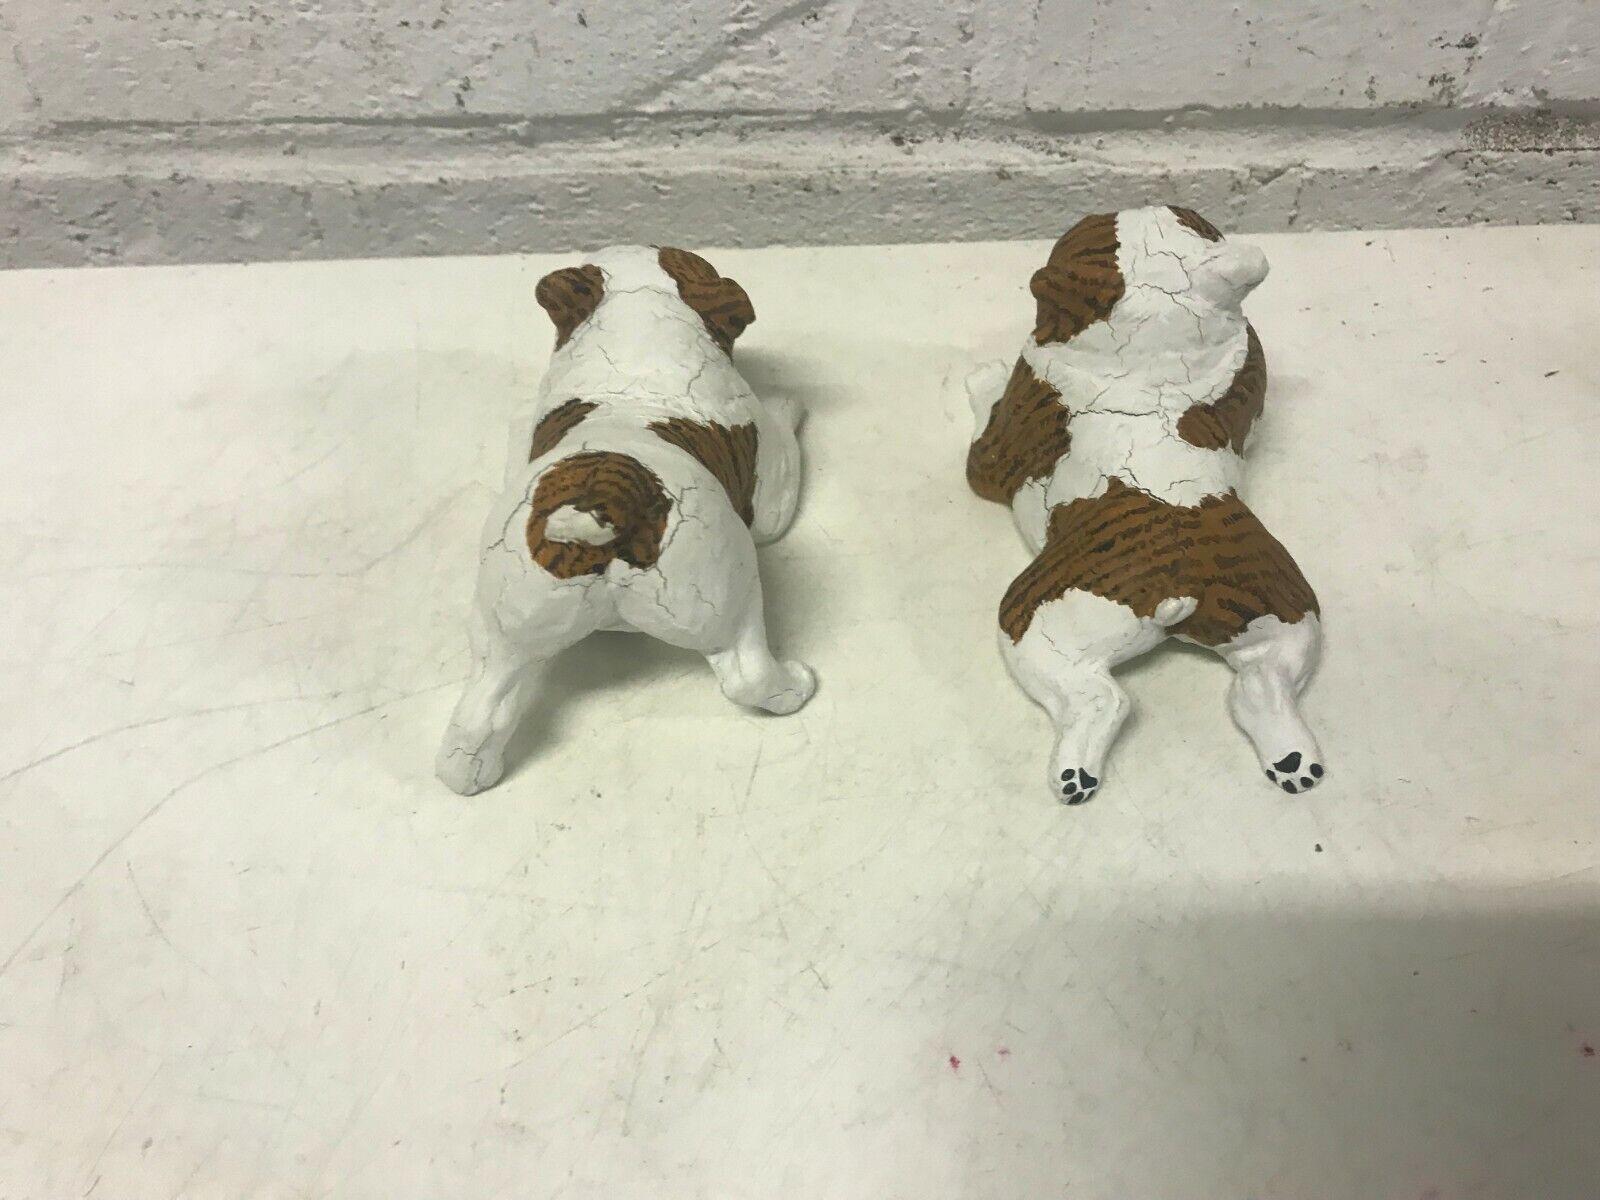 2 cece bulldog anglais figurine playing & allongé down avec os & bol signé